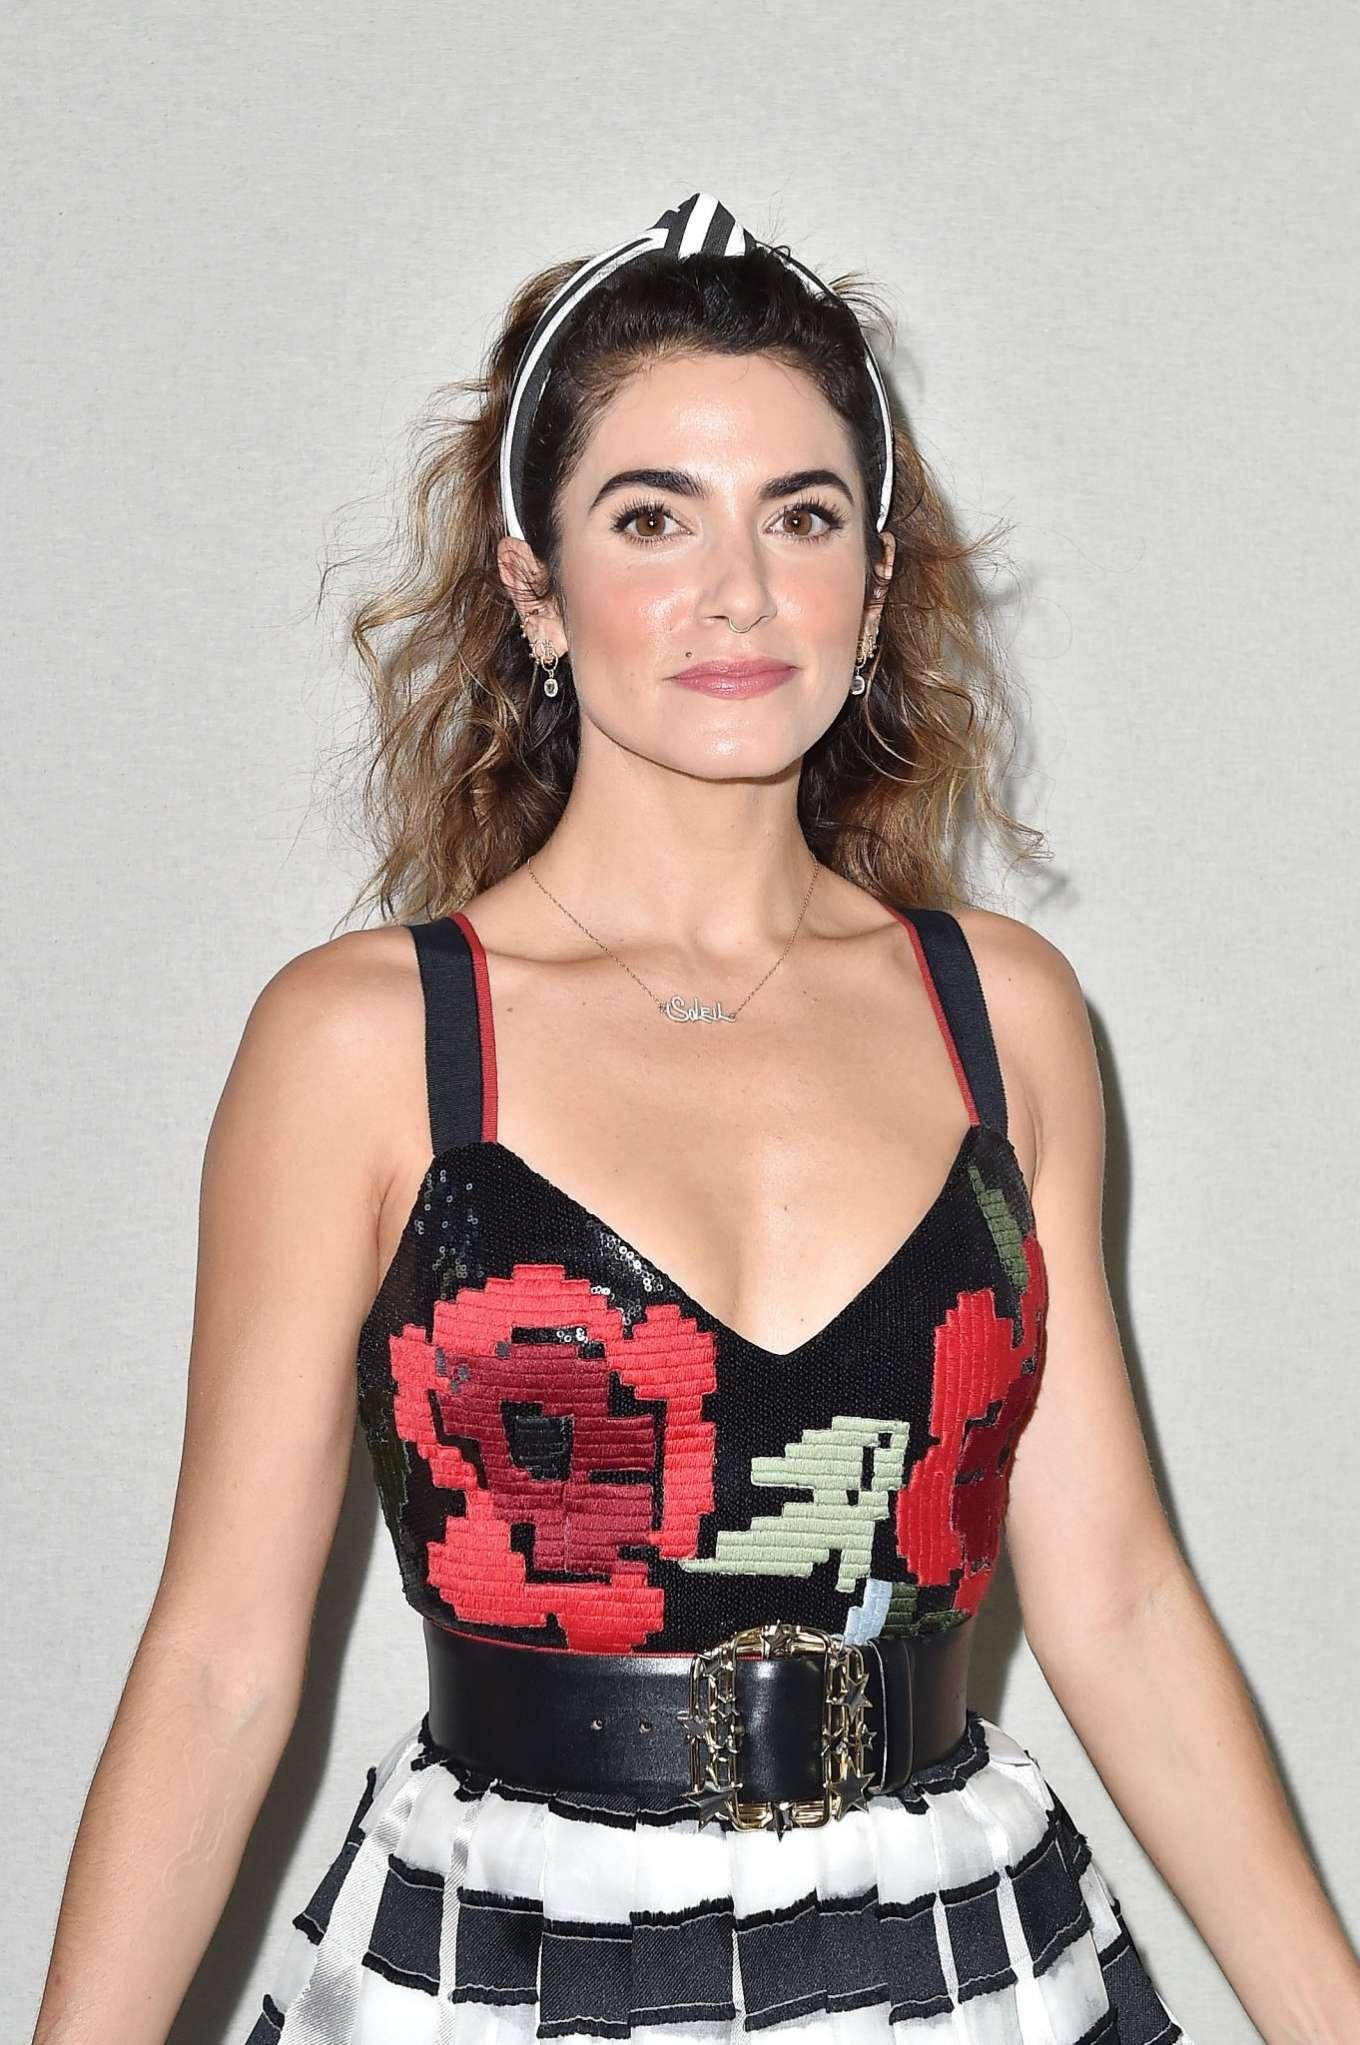 Nikki Reed 2019 : Nikki Reed – 2019 Paris Fashion Week – Elie Saab Haute Couture Fall-Winter-09